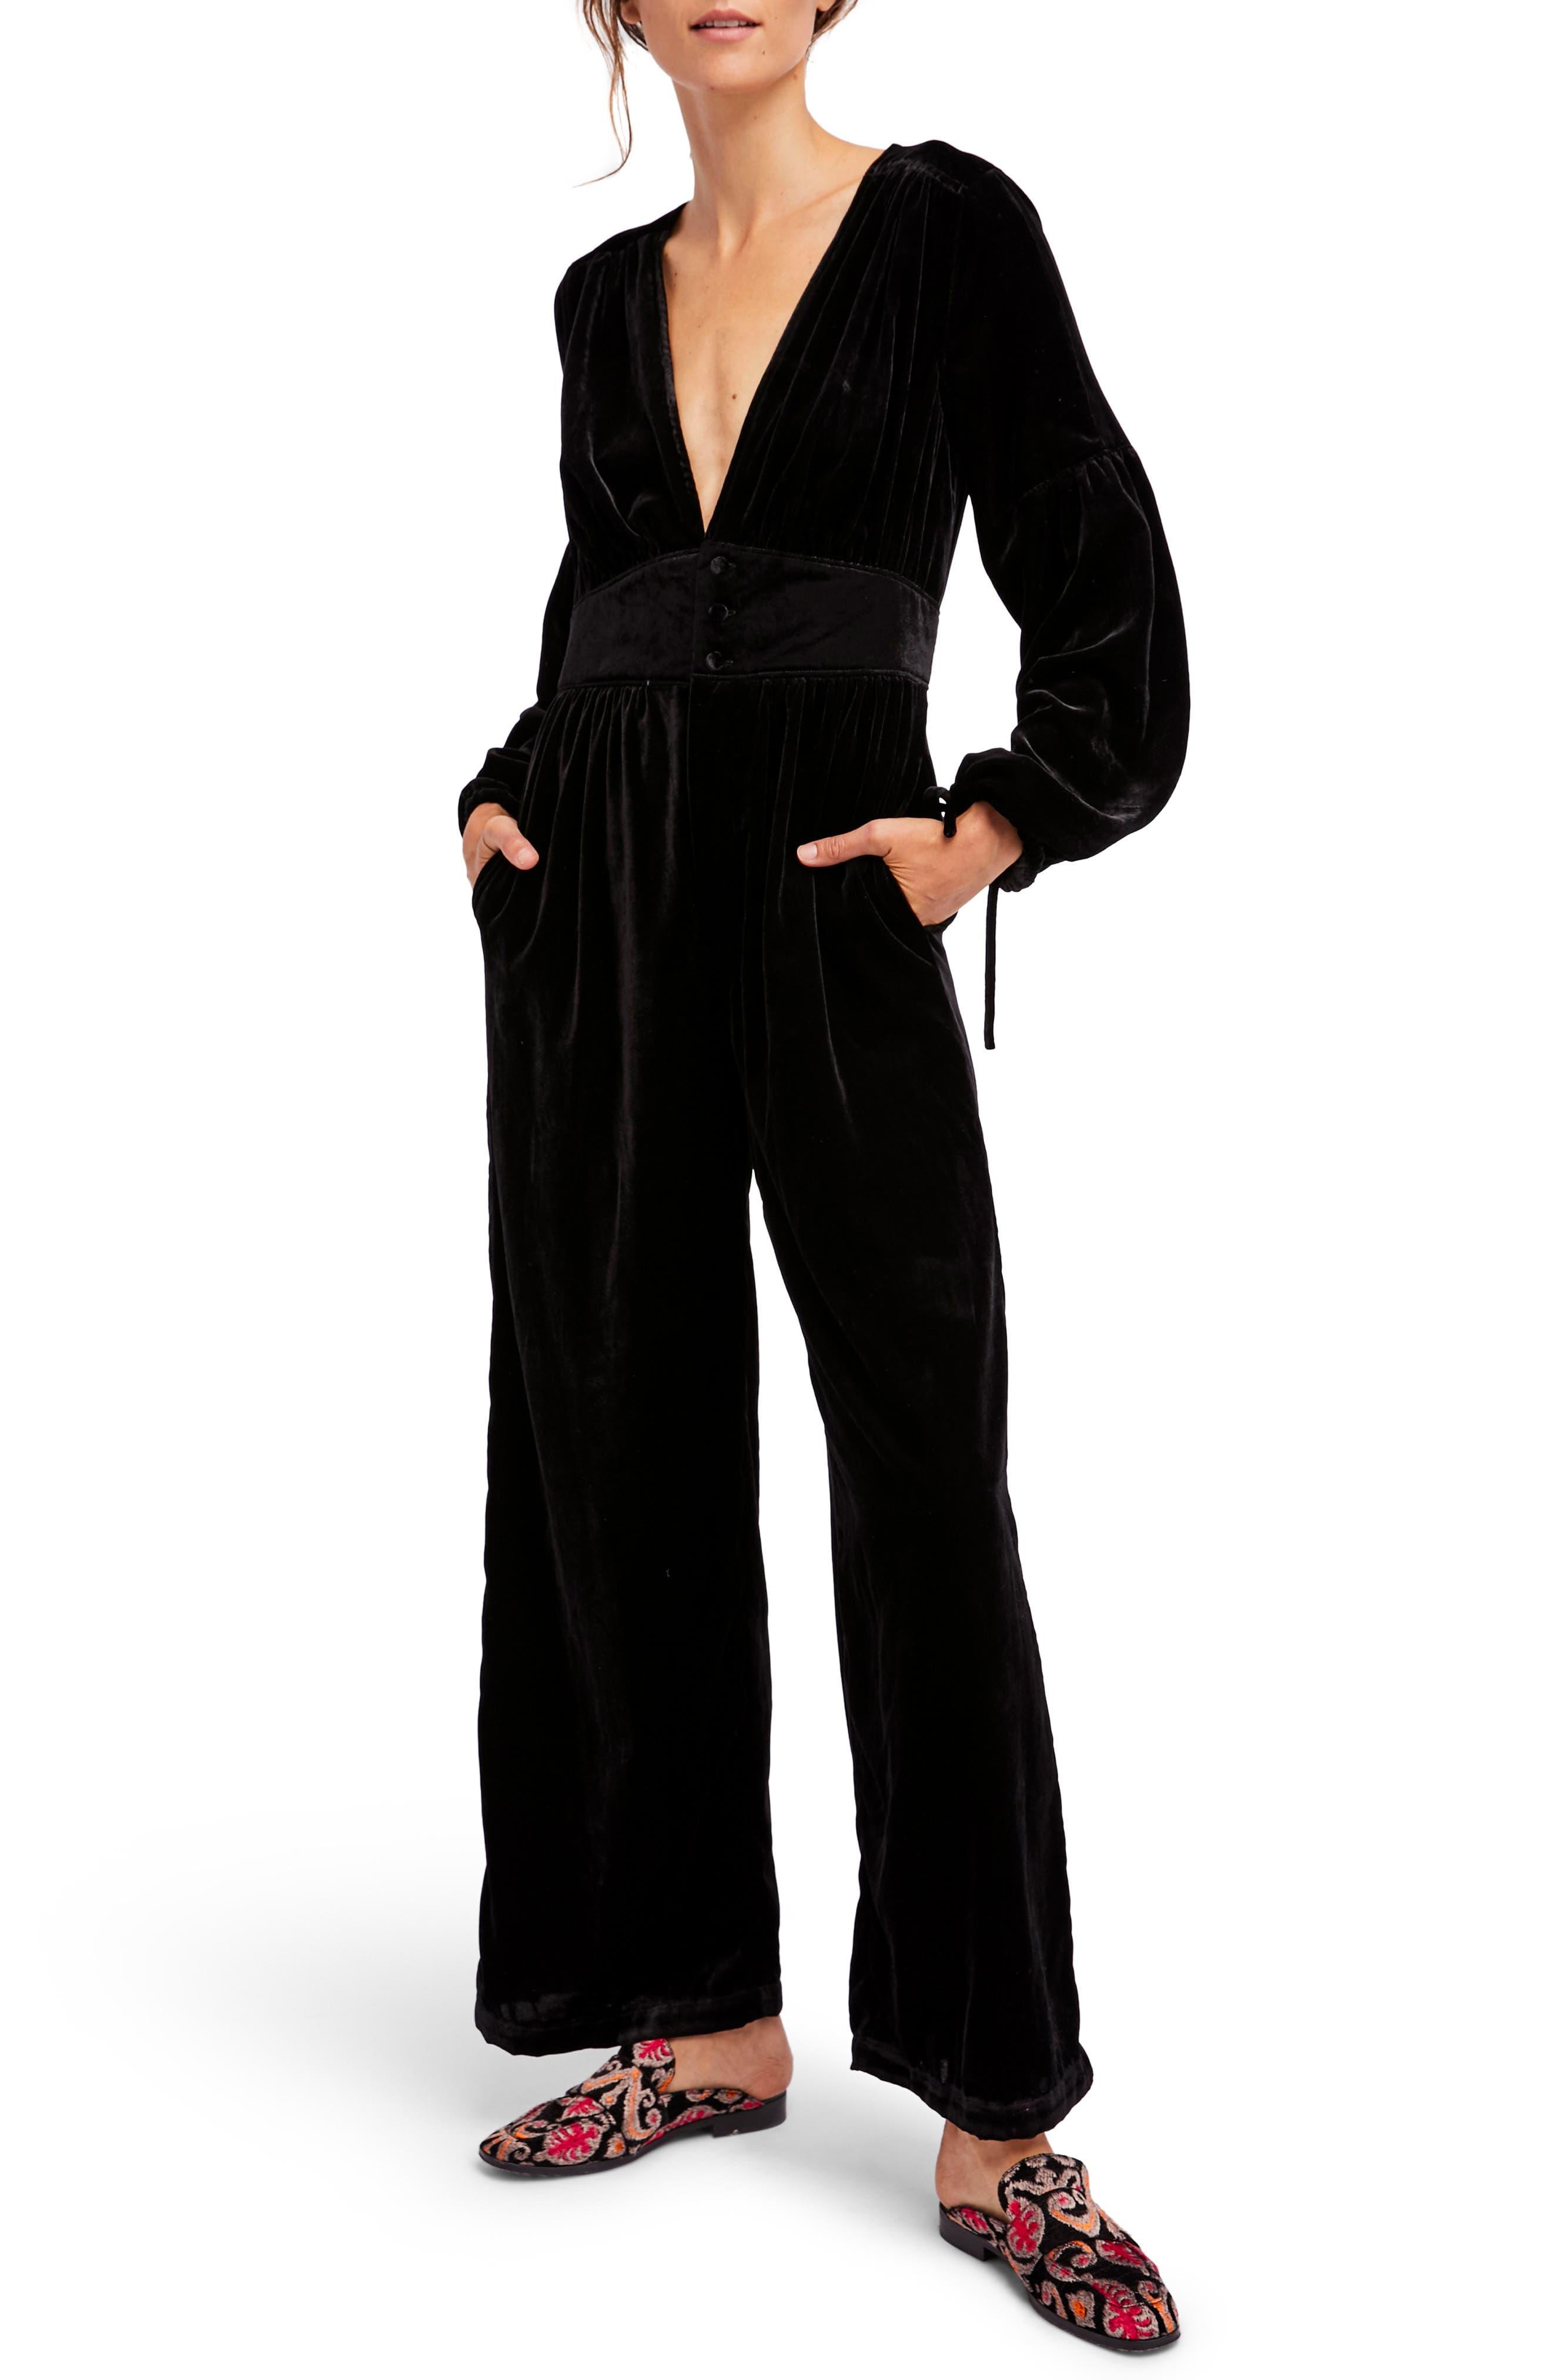 True Lovin Velvet Jumpsuit,                             Main thumbnail 1, color,                             Black